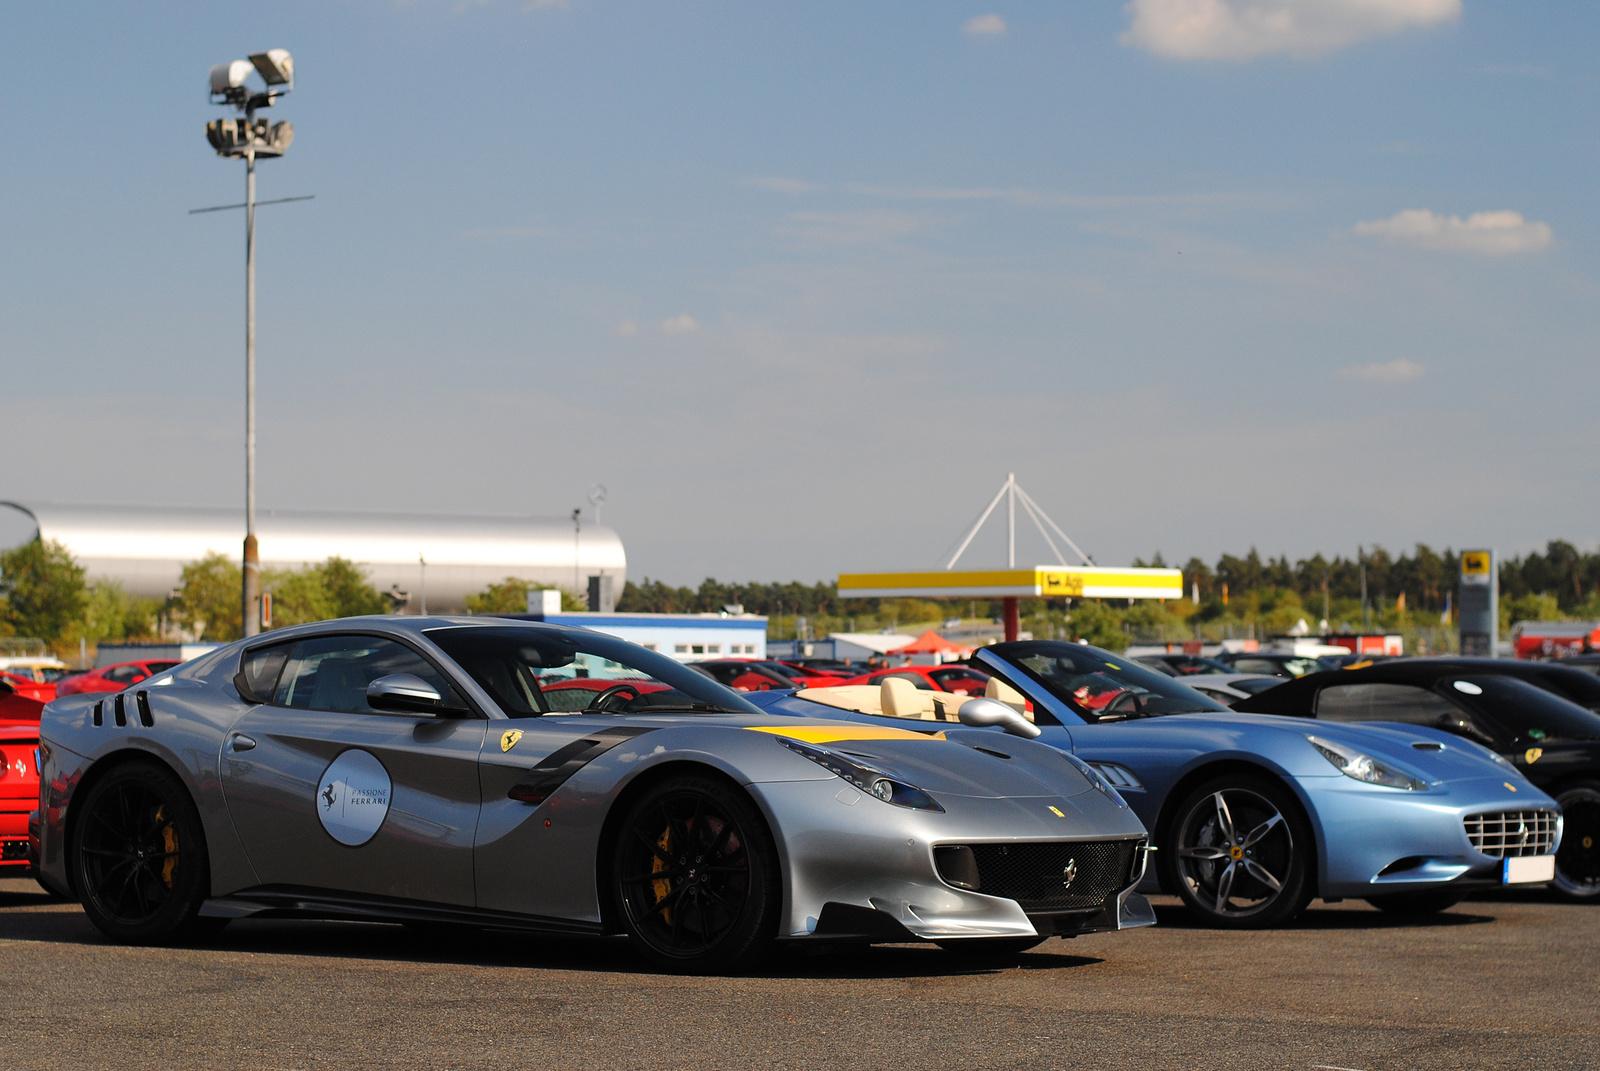 Ferrari F12tdf - Ferrari California